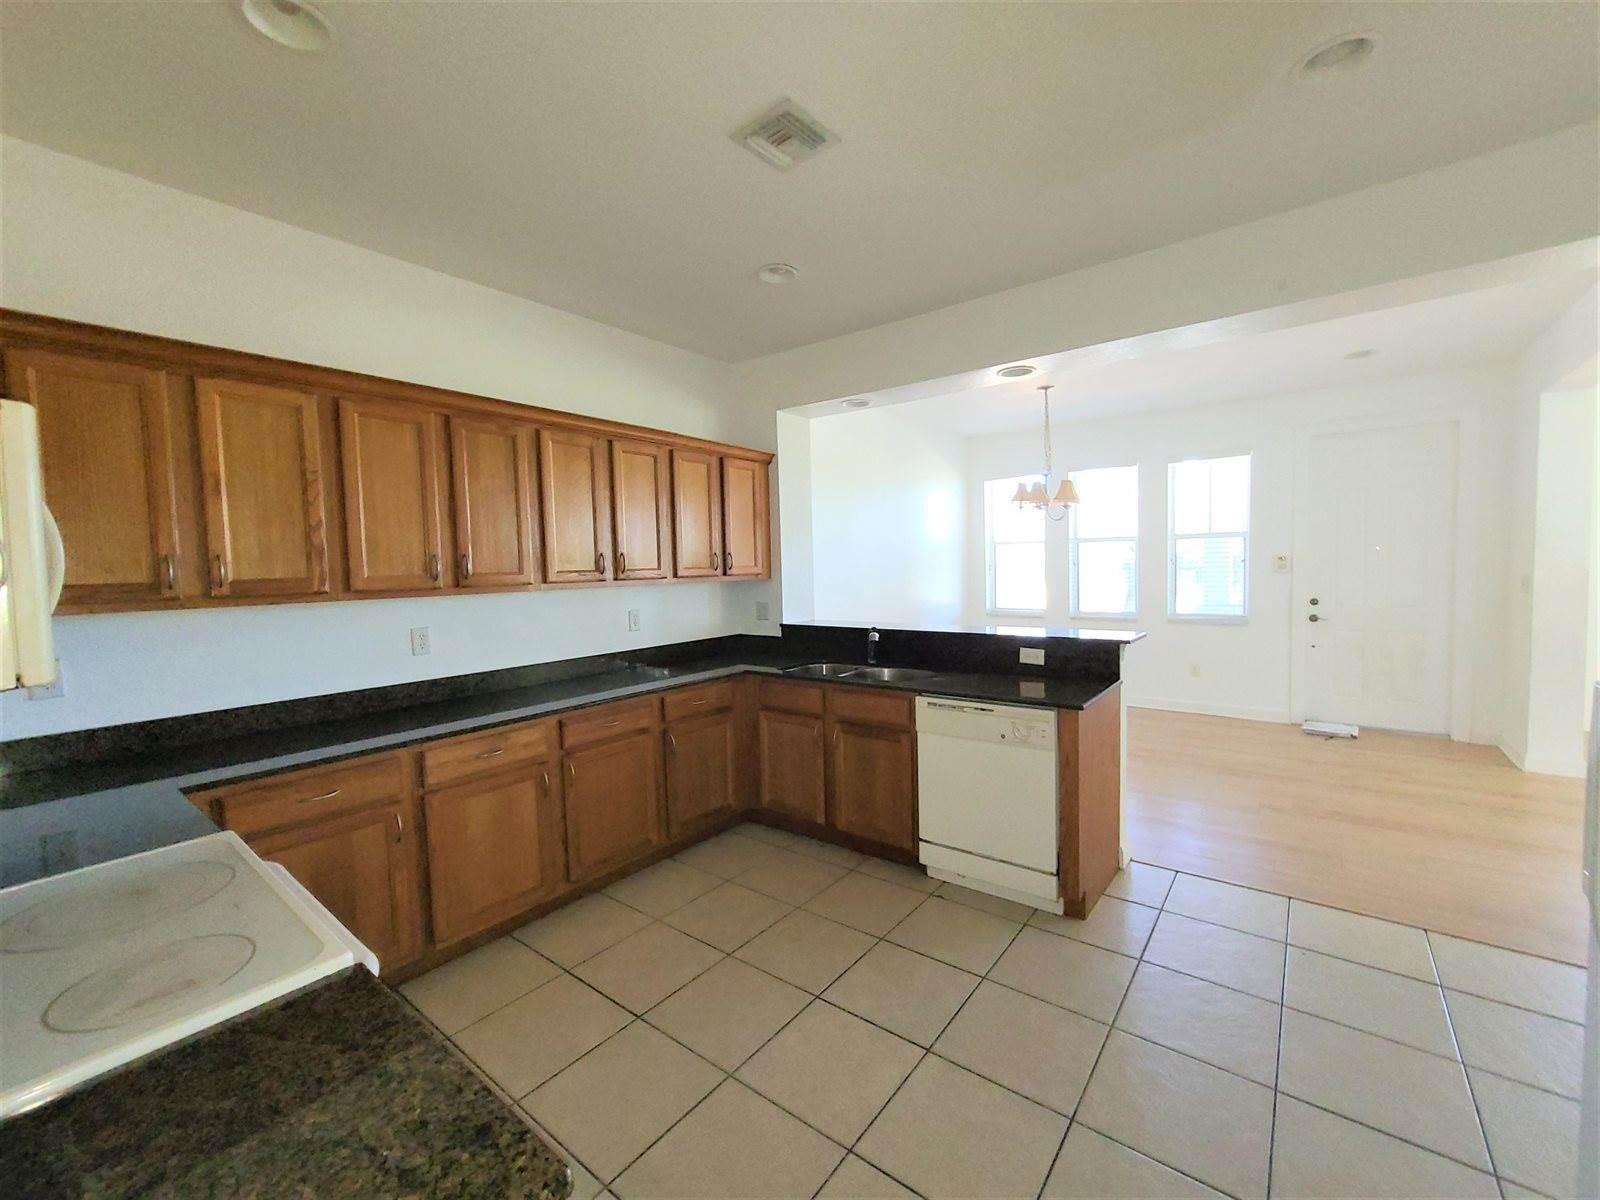 990 Millbrae Court, #2, West Palm Beach, FL 33401